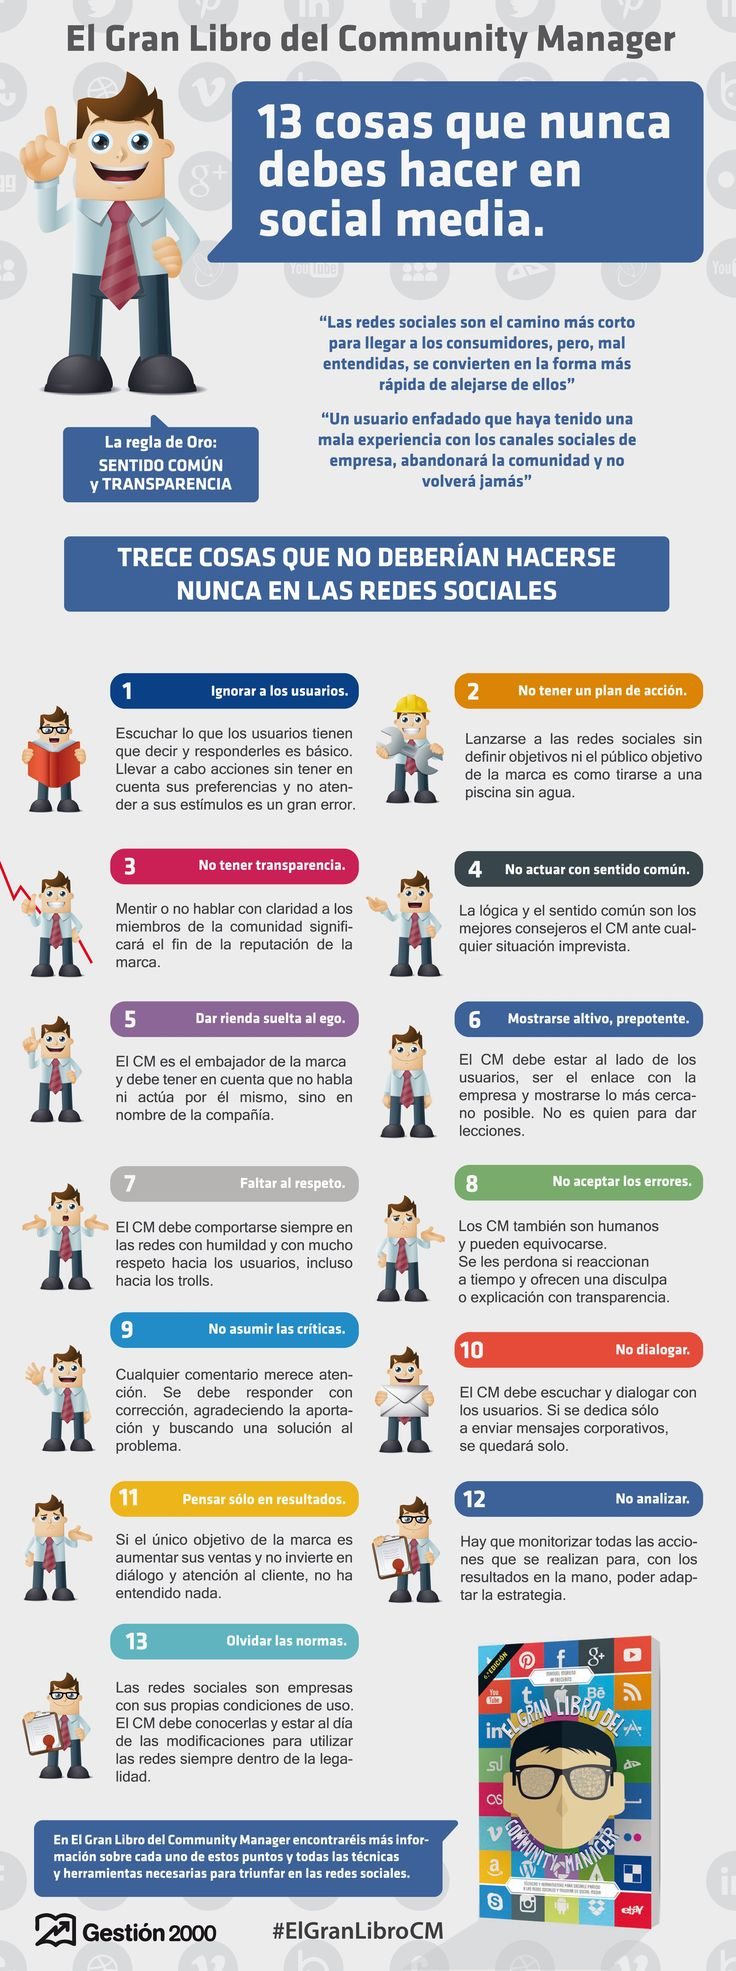 13-cosas-que-no-debes-hacer-enredes-sociales-infografia.jpg 2,480×6,643 pixeles